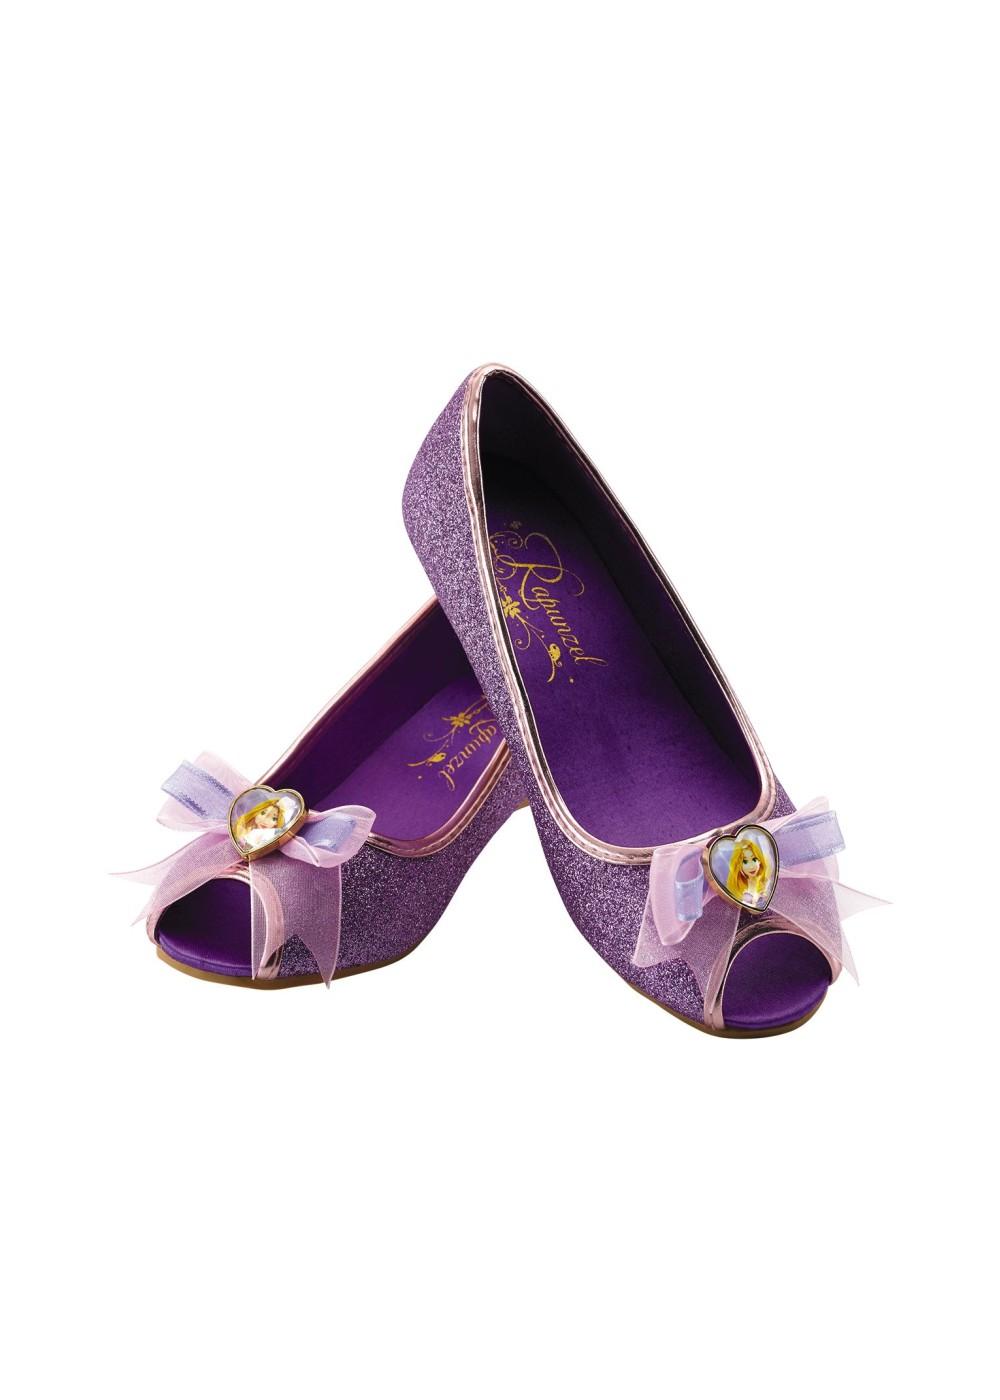 Rapunzel Girls Shoes Shoes